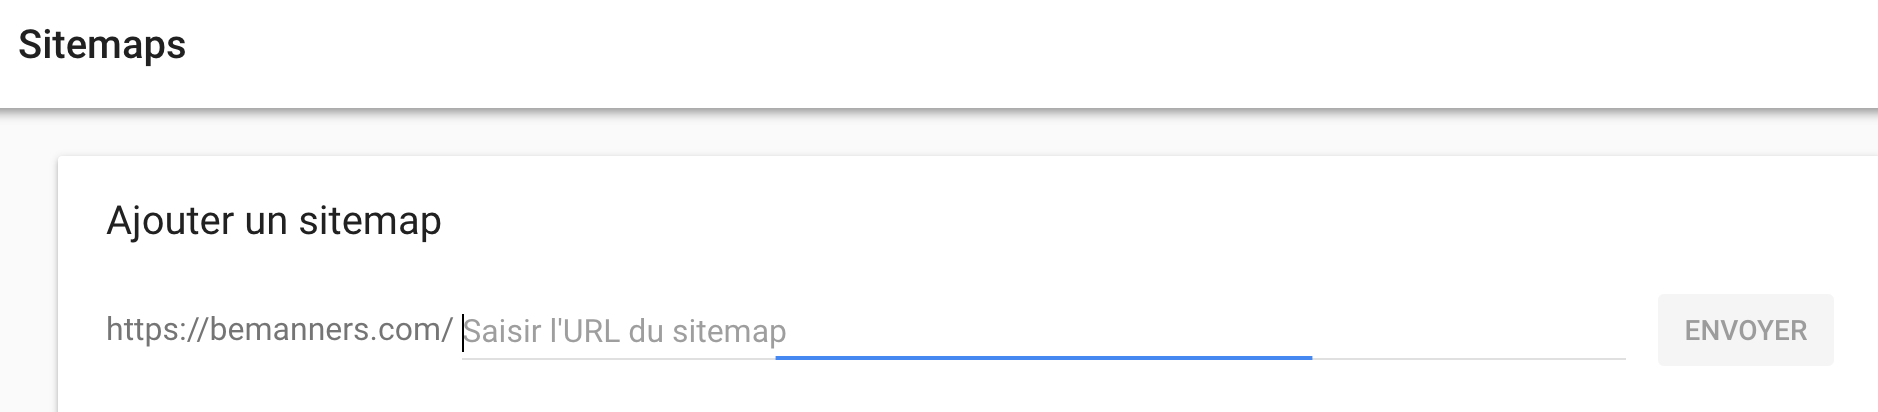 sitemap-parameterization-google-search-console